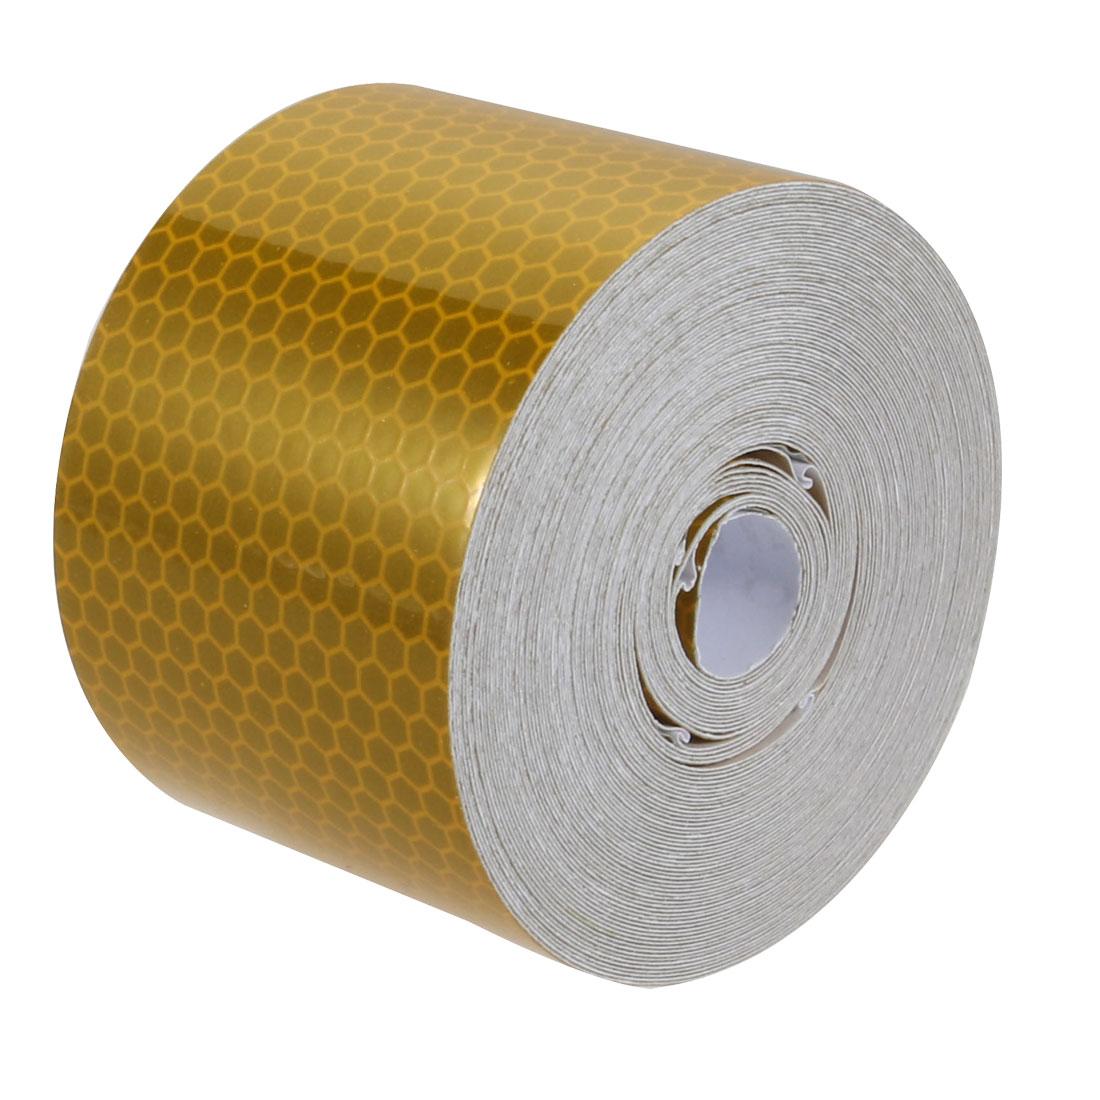 5cm Width 10Meter Length Honeycomb Adhesive Reflective Warning Tape Yellow